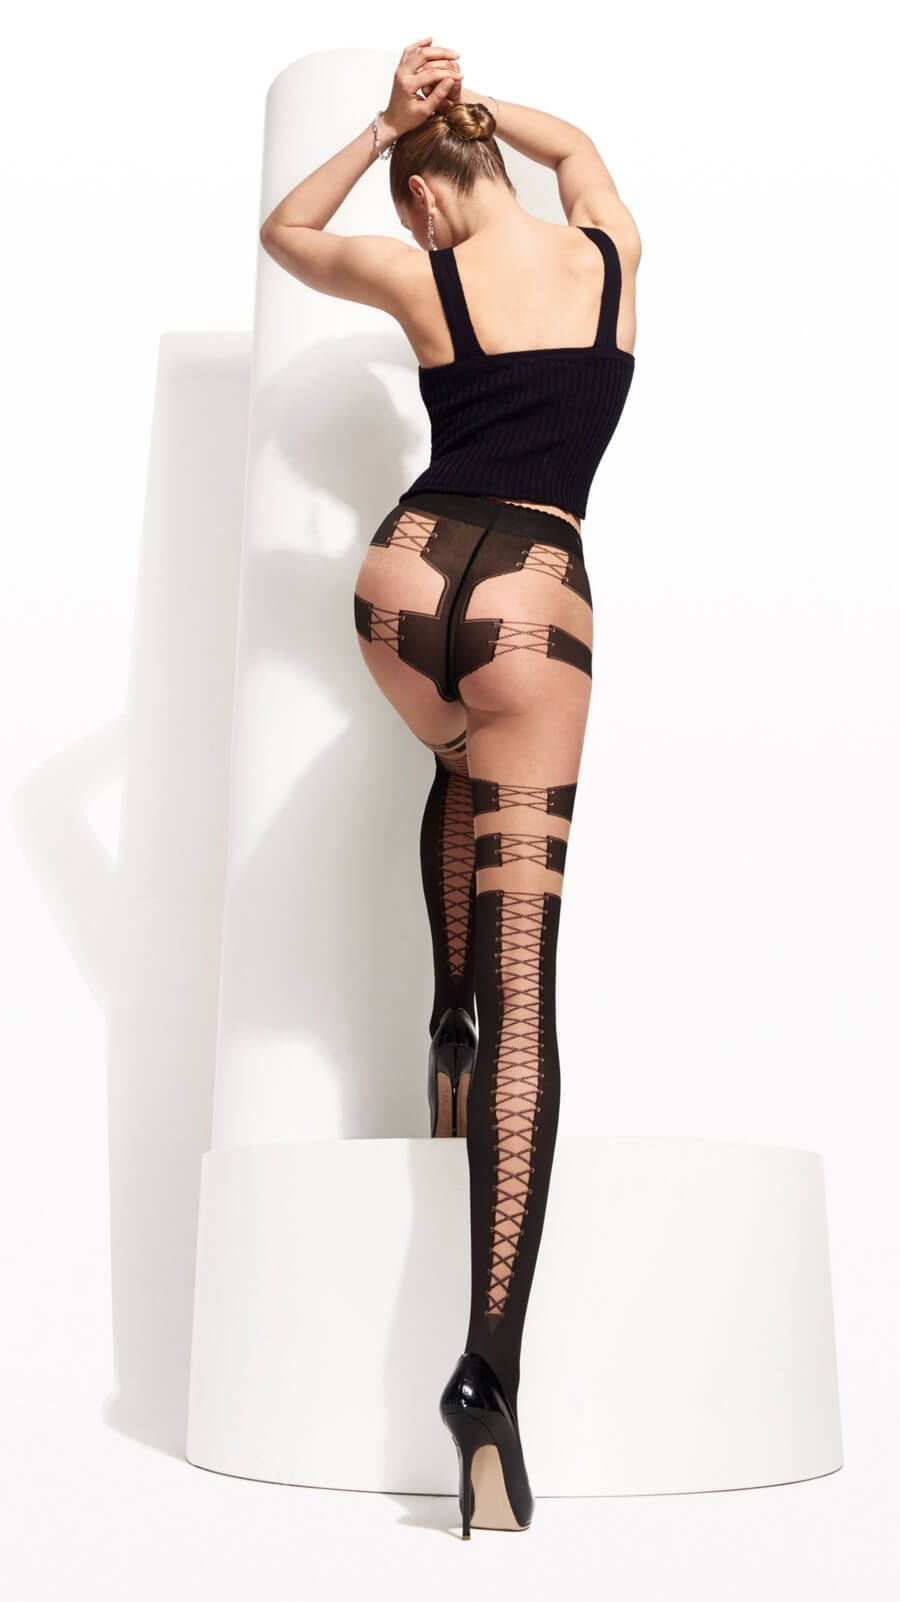 Trasparenze Calze Collants Black dot tights